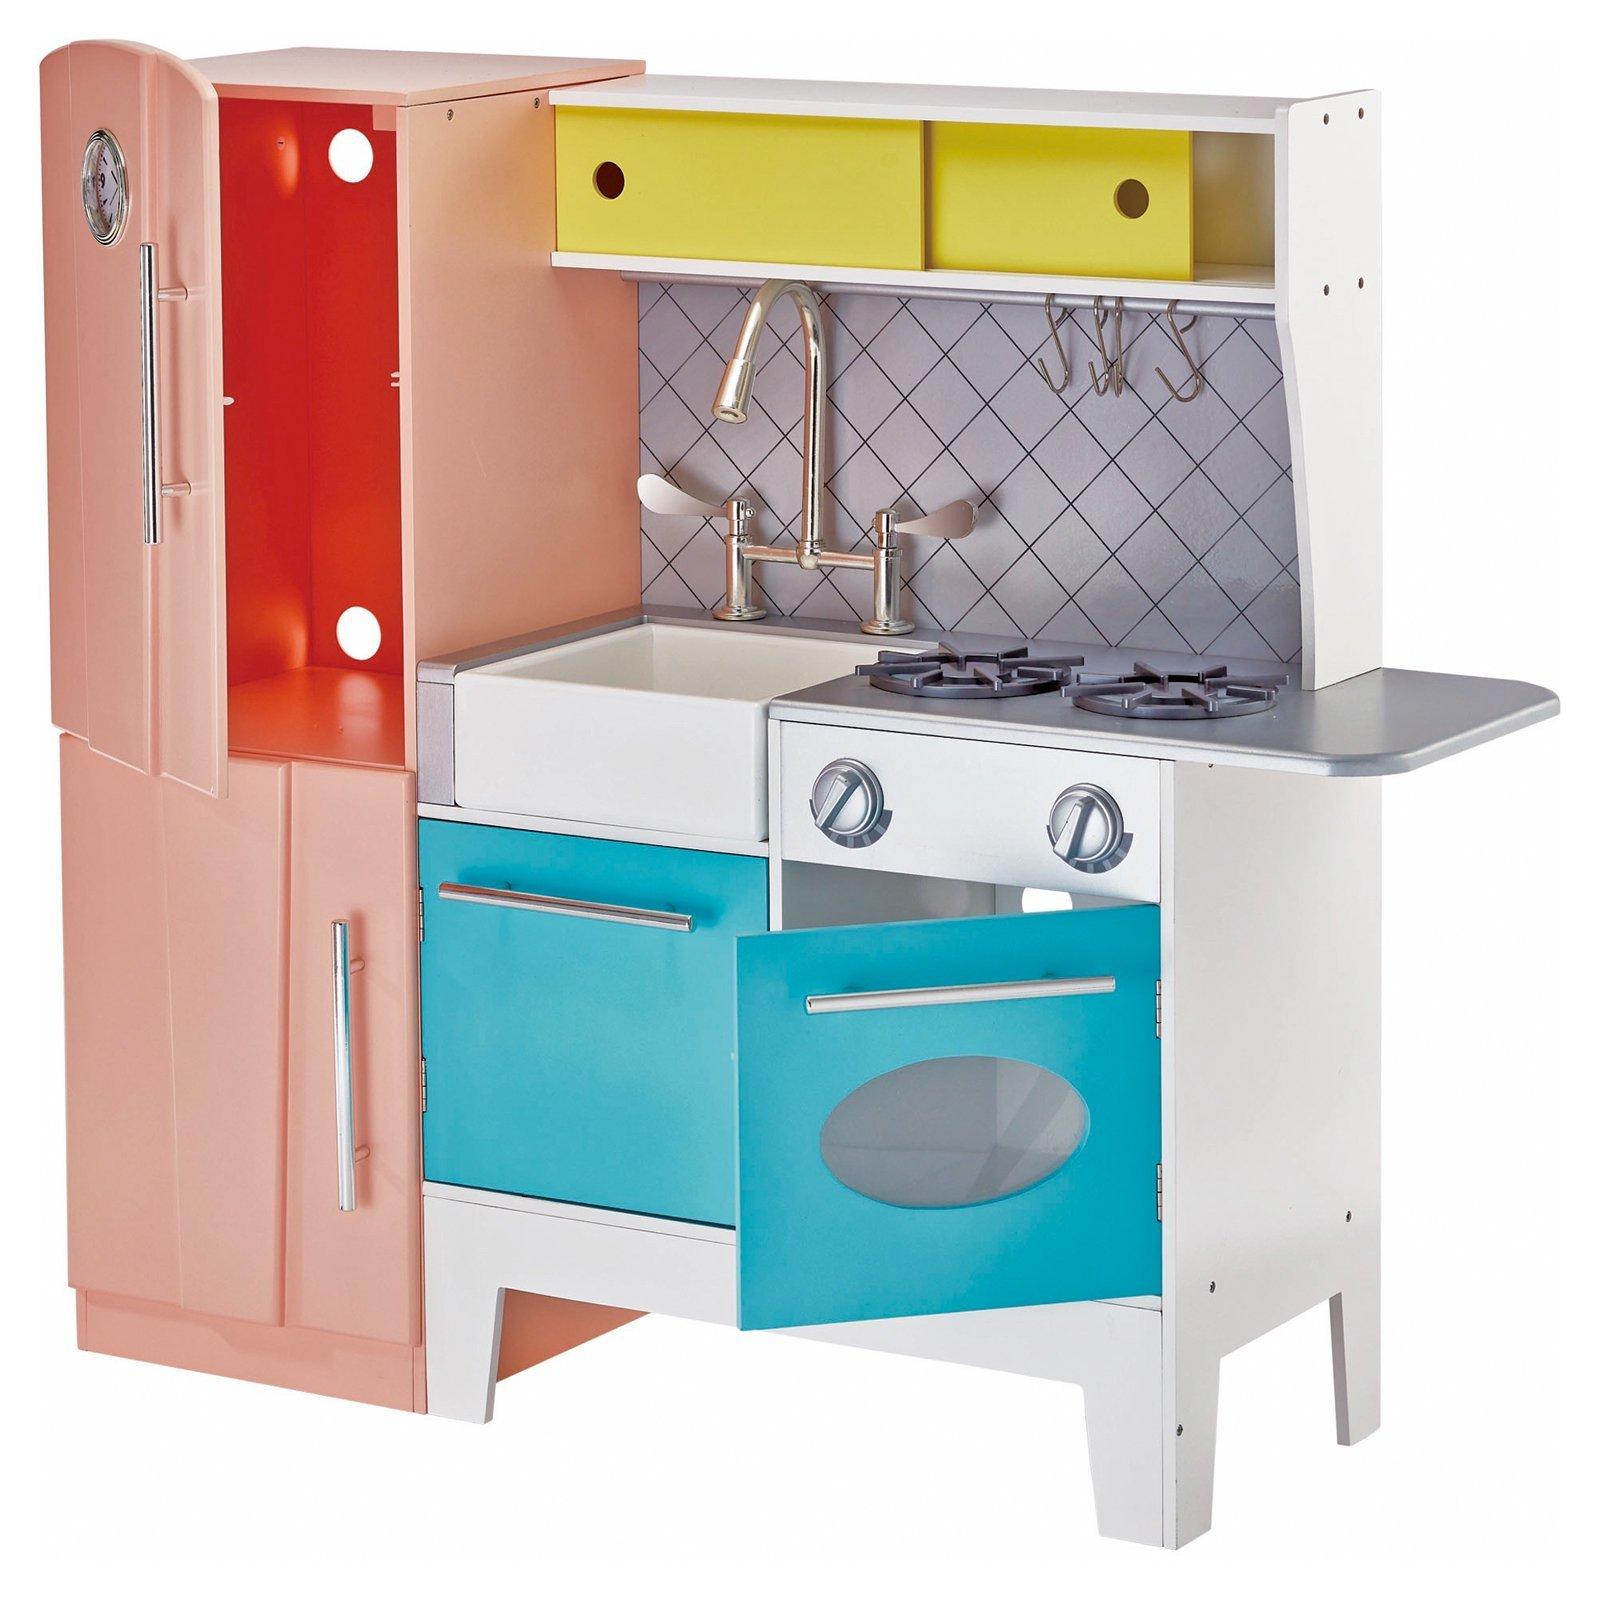 Teamson Design Kids Playful Bubble Gum Wooden Play Kitchen